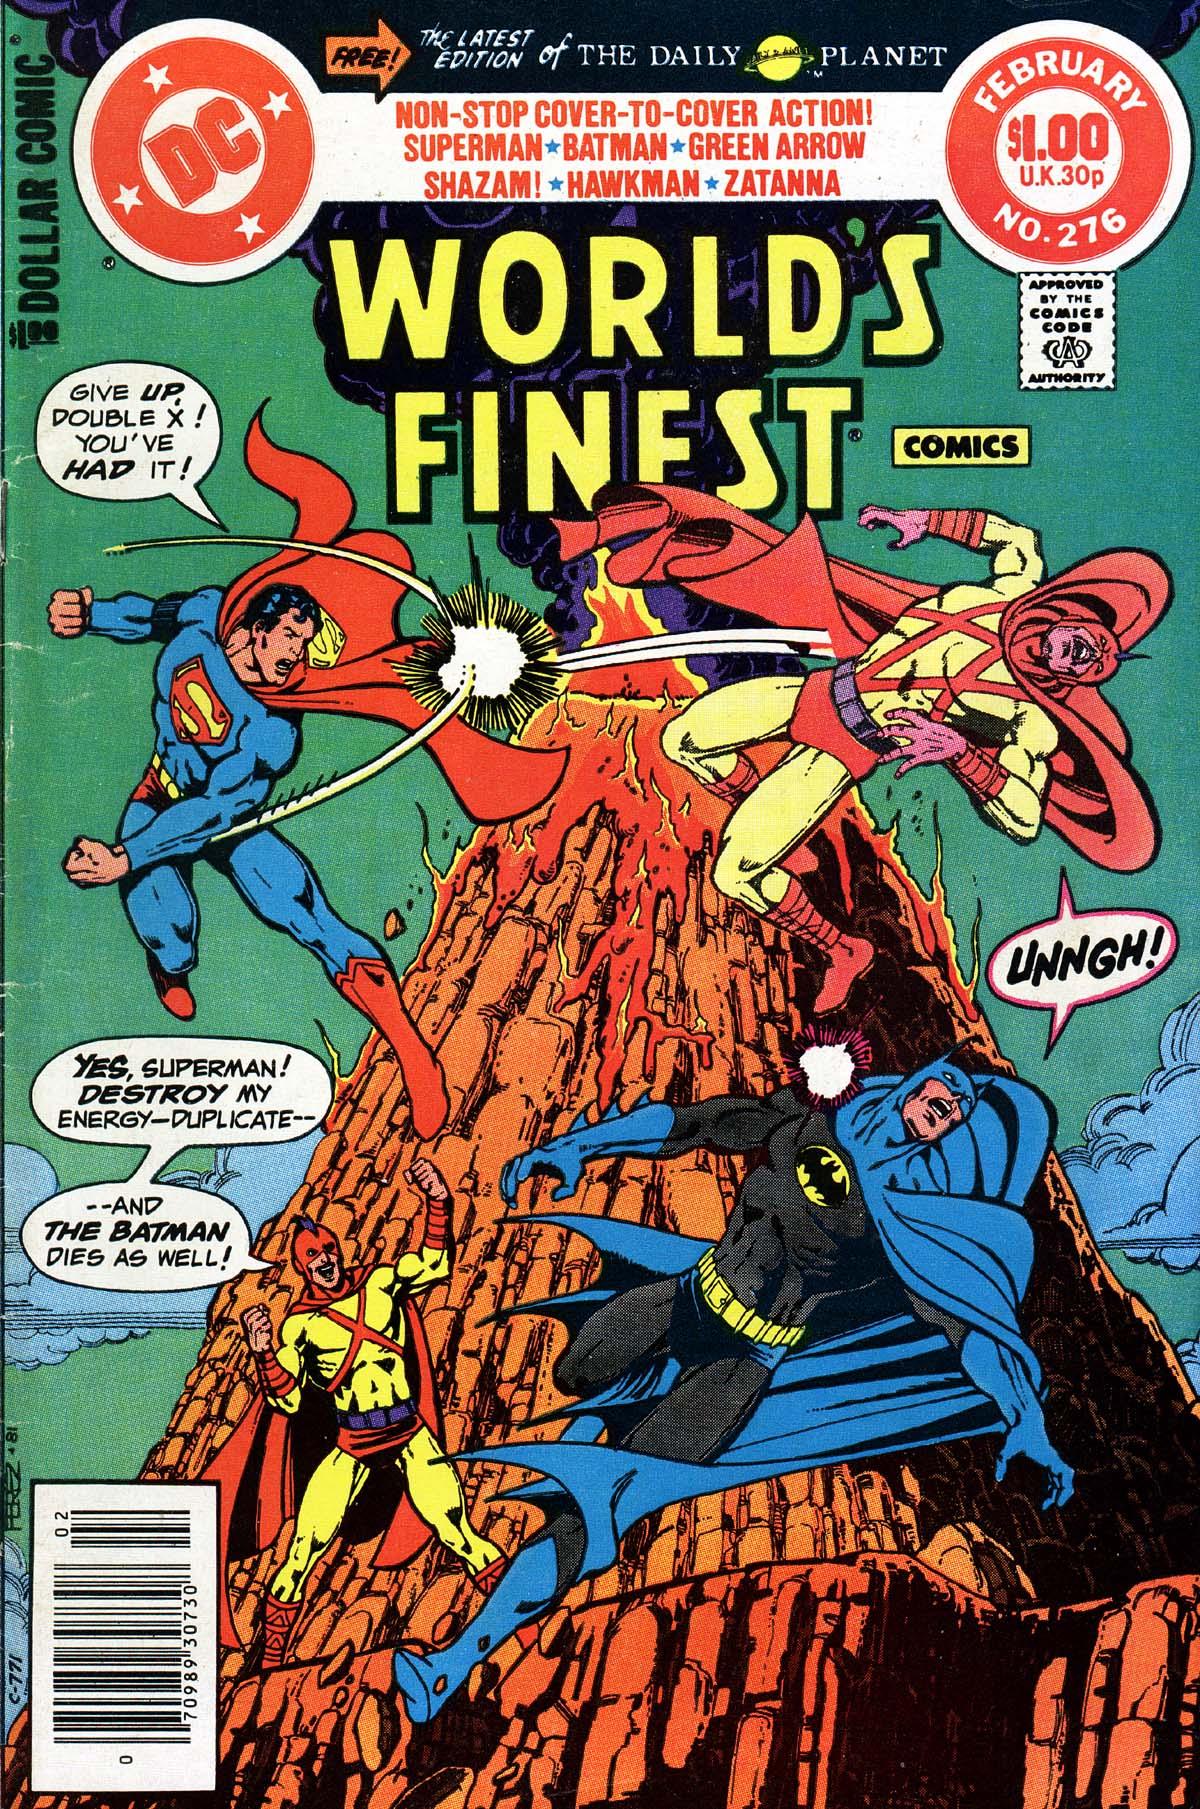 Read online World's Finest Comics comic -  Issue #276 - 1